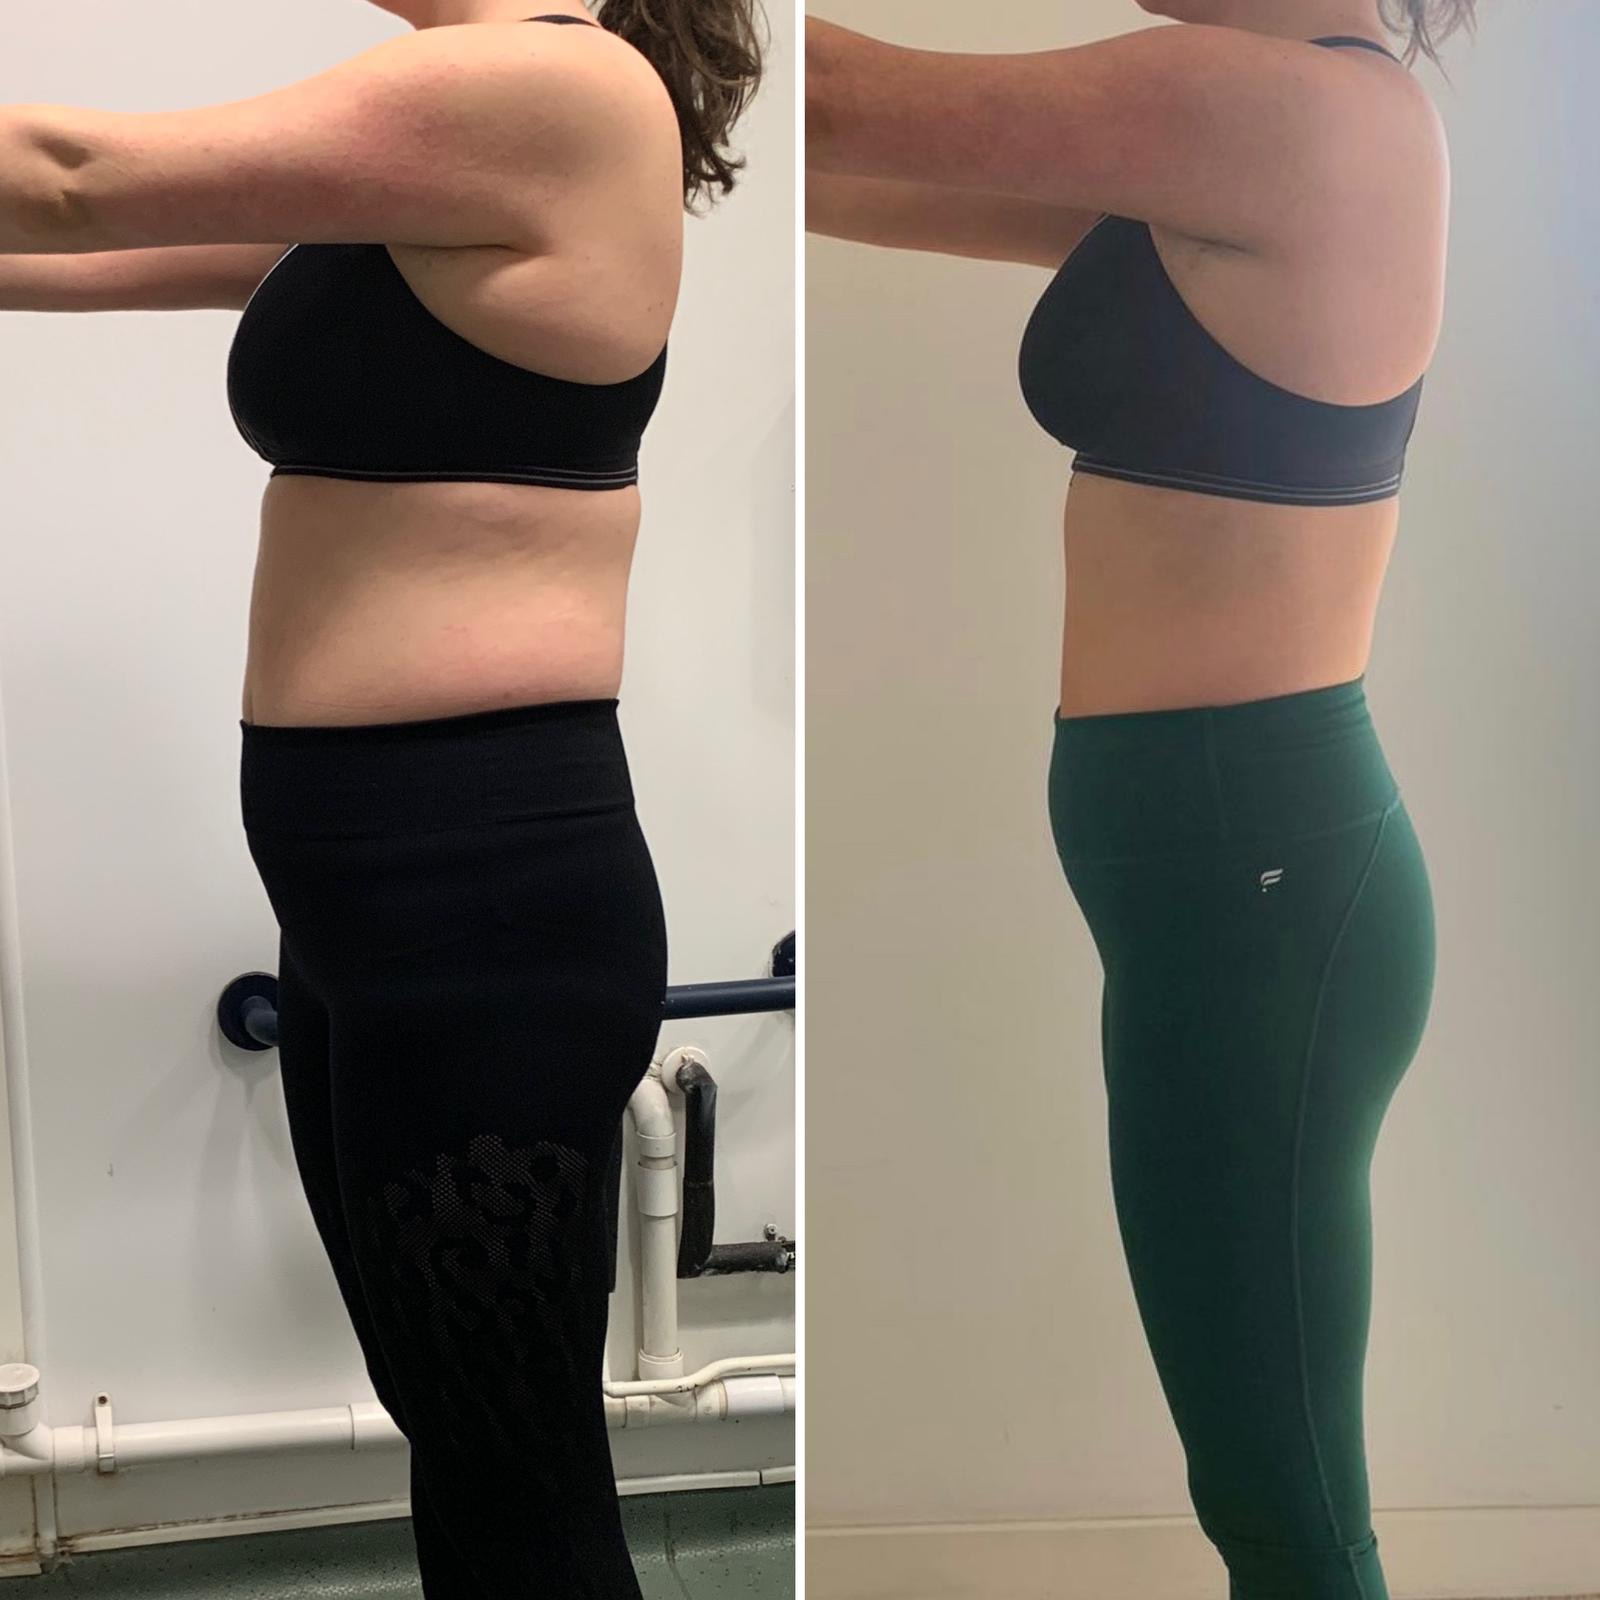 GymHippie | Fat Loss & Body Shaping Strategies @ Buzz Gym - Reading, Berkshire